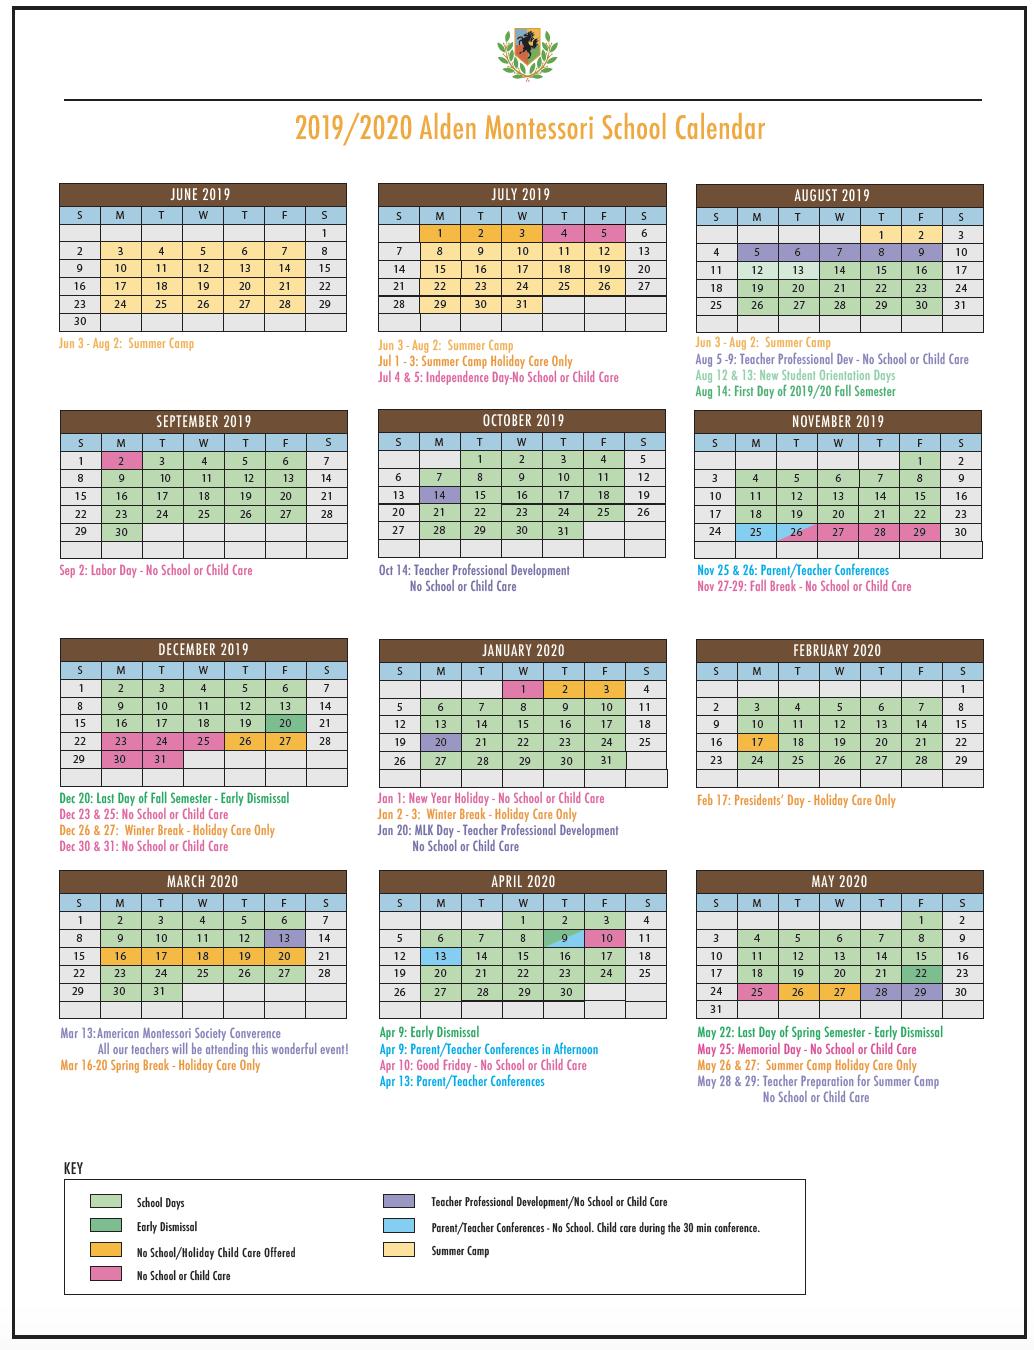 alden calendar 2019:20